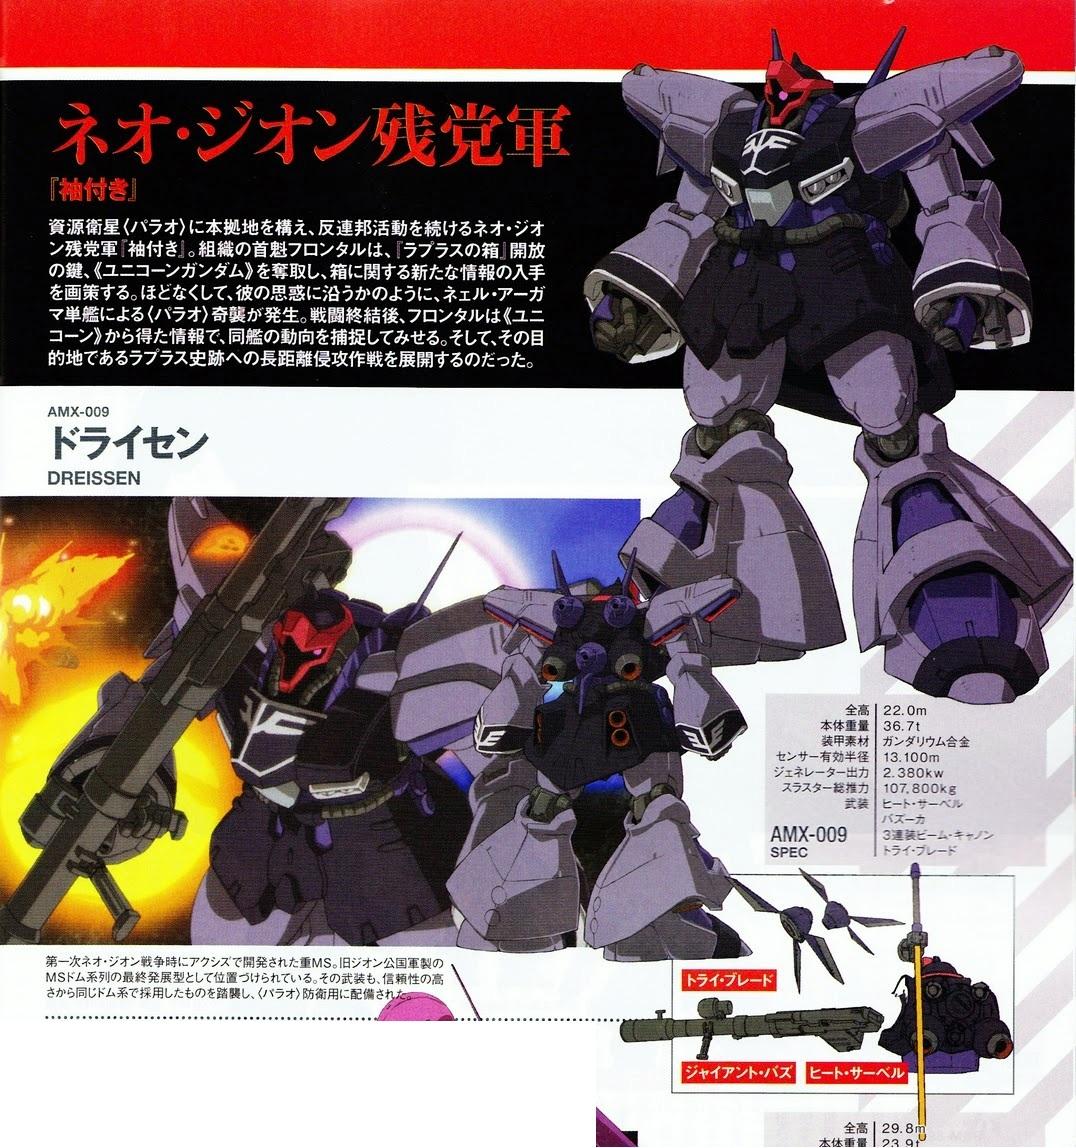 Mobile Suit Gundam Unicorn Anime Tv Tropes Hg Mechanics Dendrobium